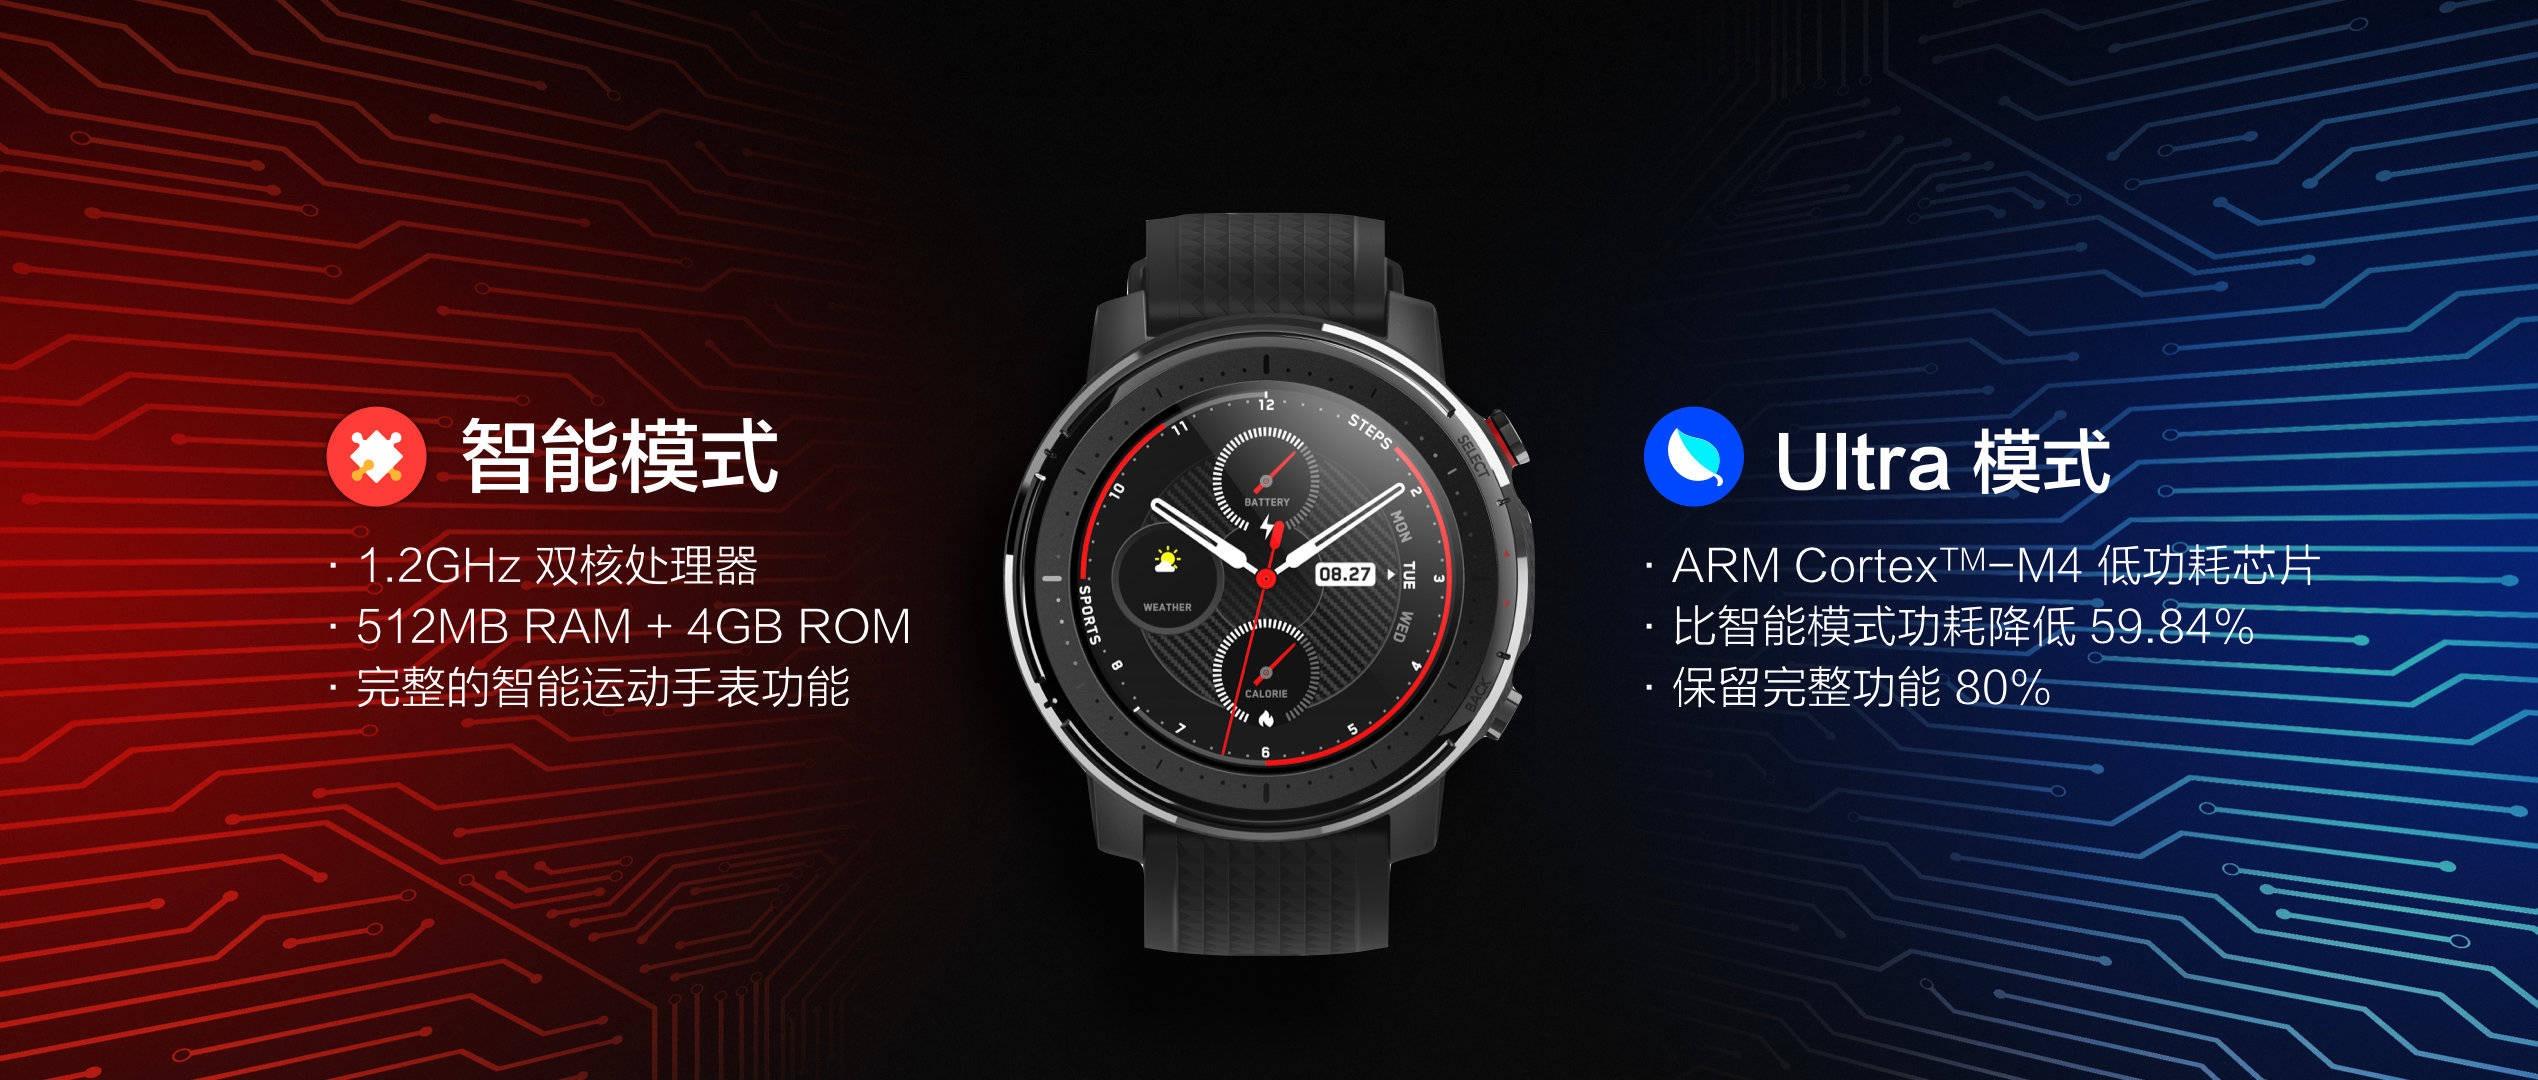 Amazfit Smart Sports Watch 3 ، الميزات والسعر والمواصفات. أخبار xiaomi المدمنين